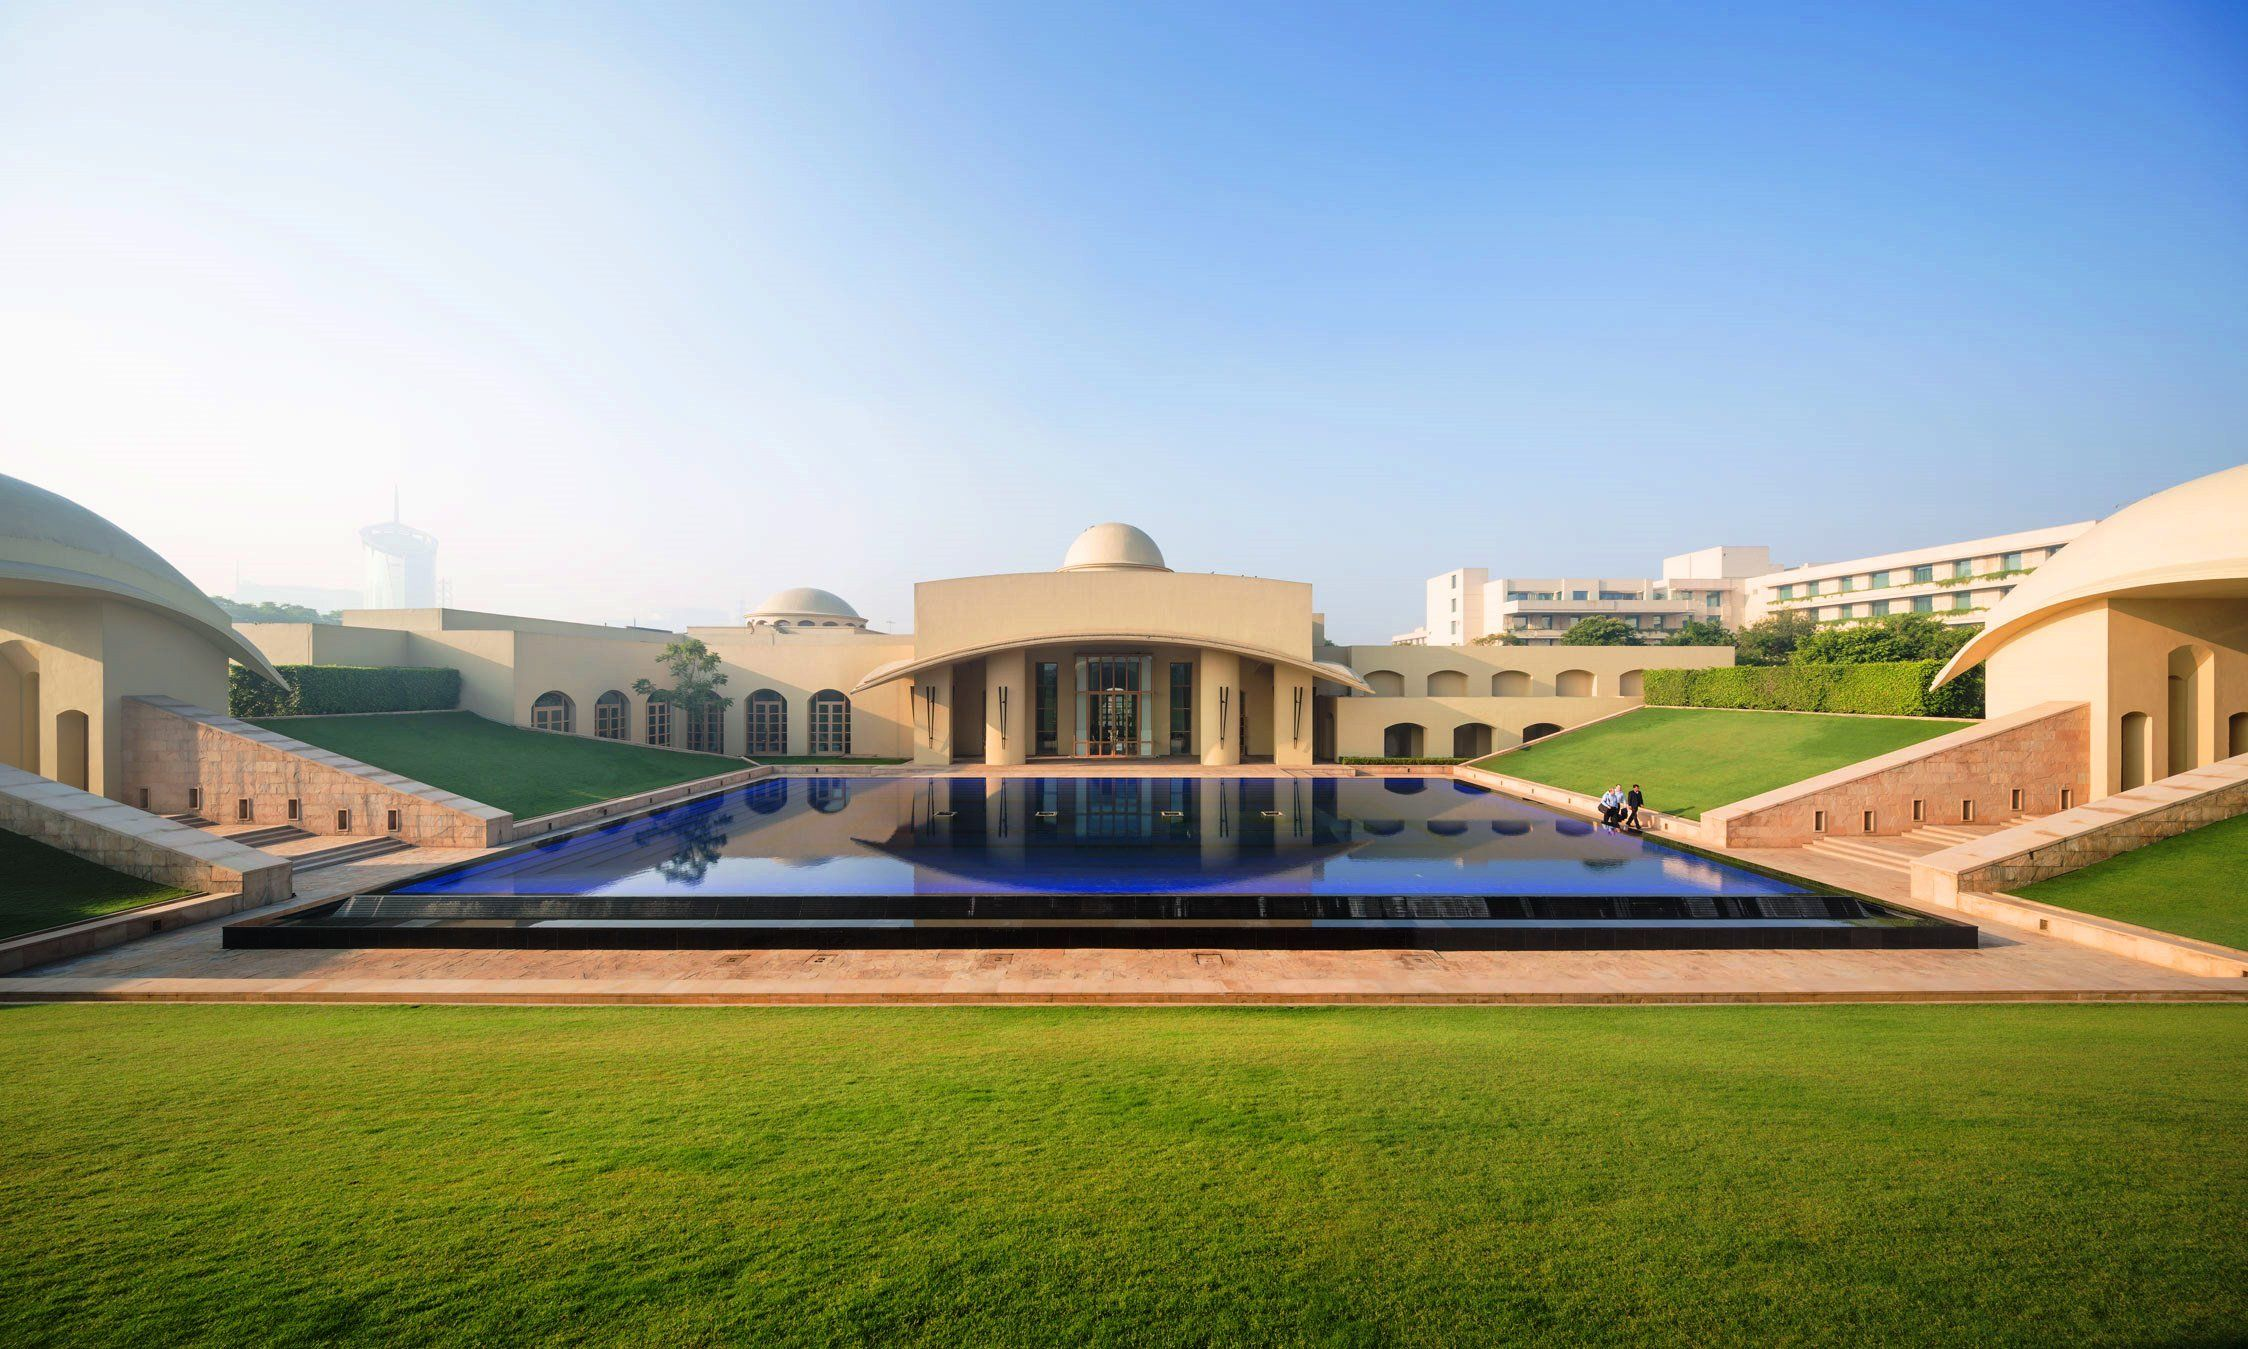 Trident, Gurgaon, Is Set Amongst 7 Acres Of Landscaped Gardens,